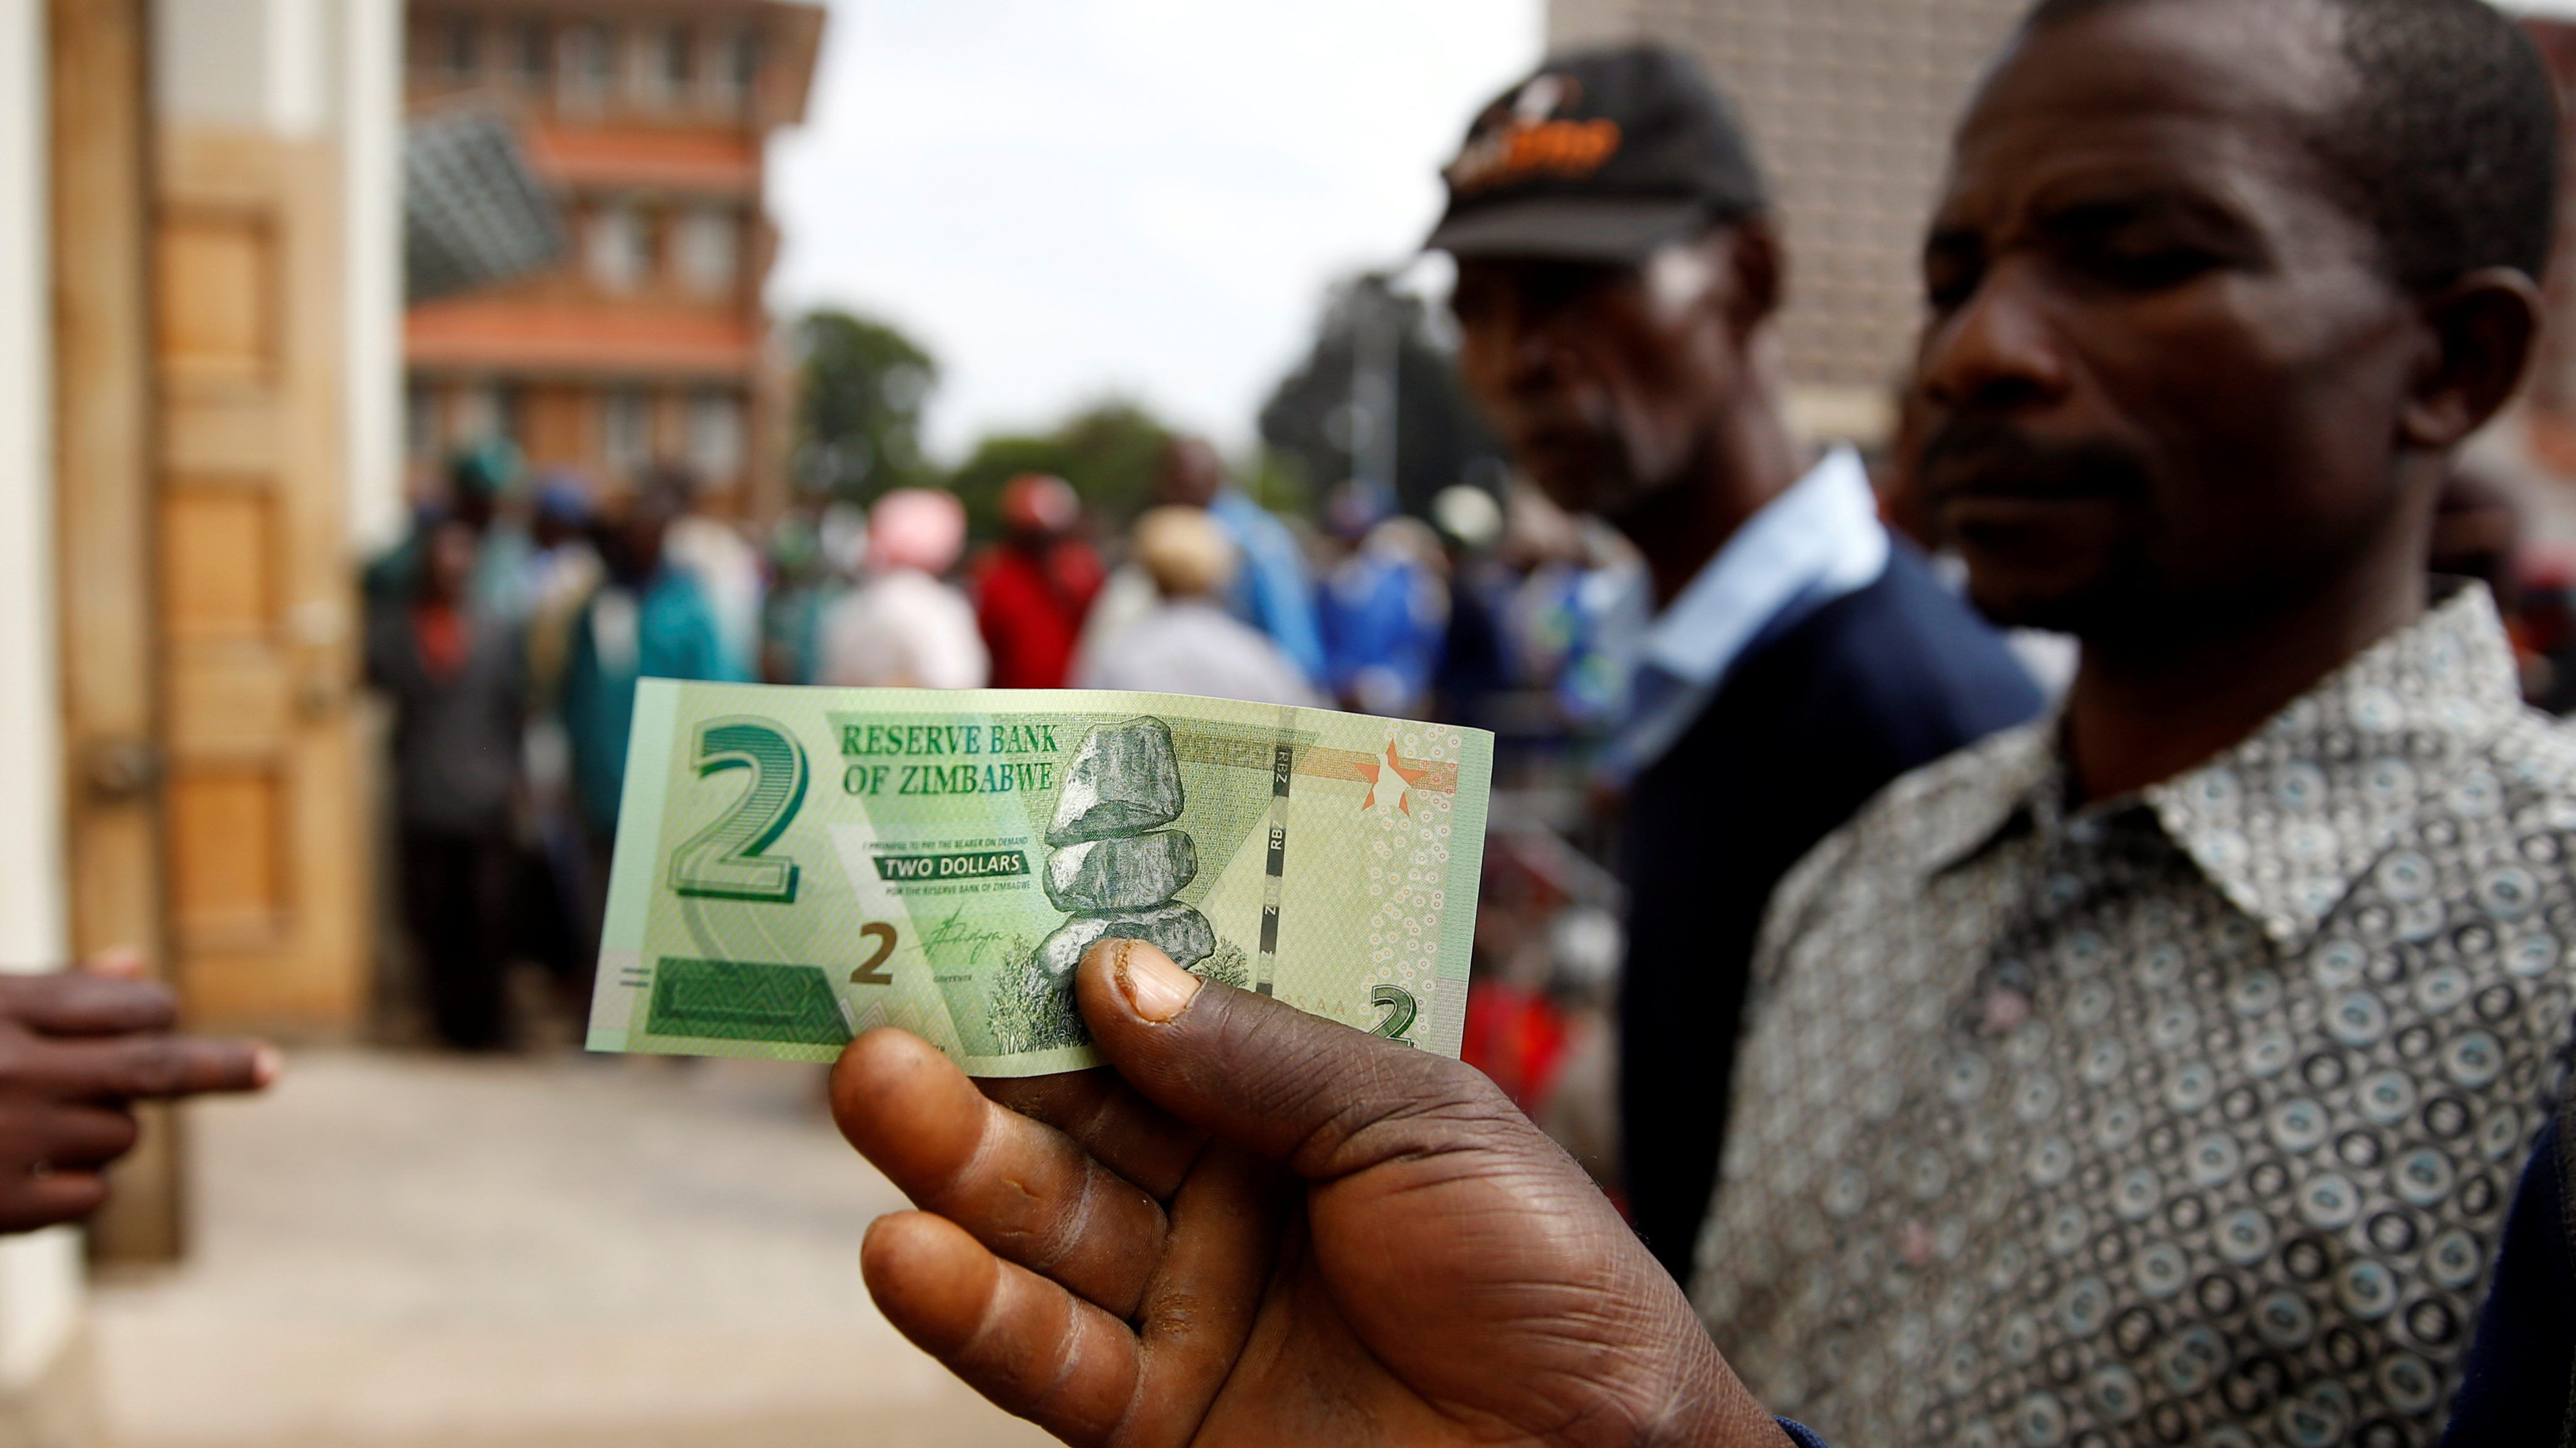 Zimbabwe's central bank says the dominant mobile money platform is running a Ponzi scheme